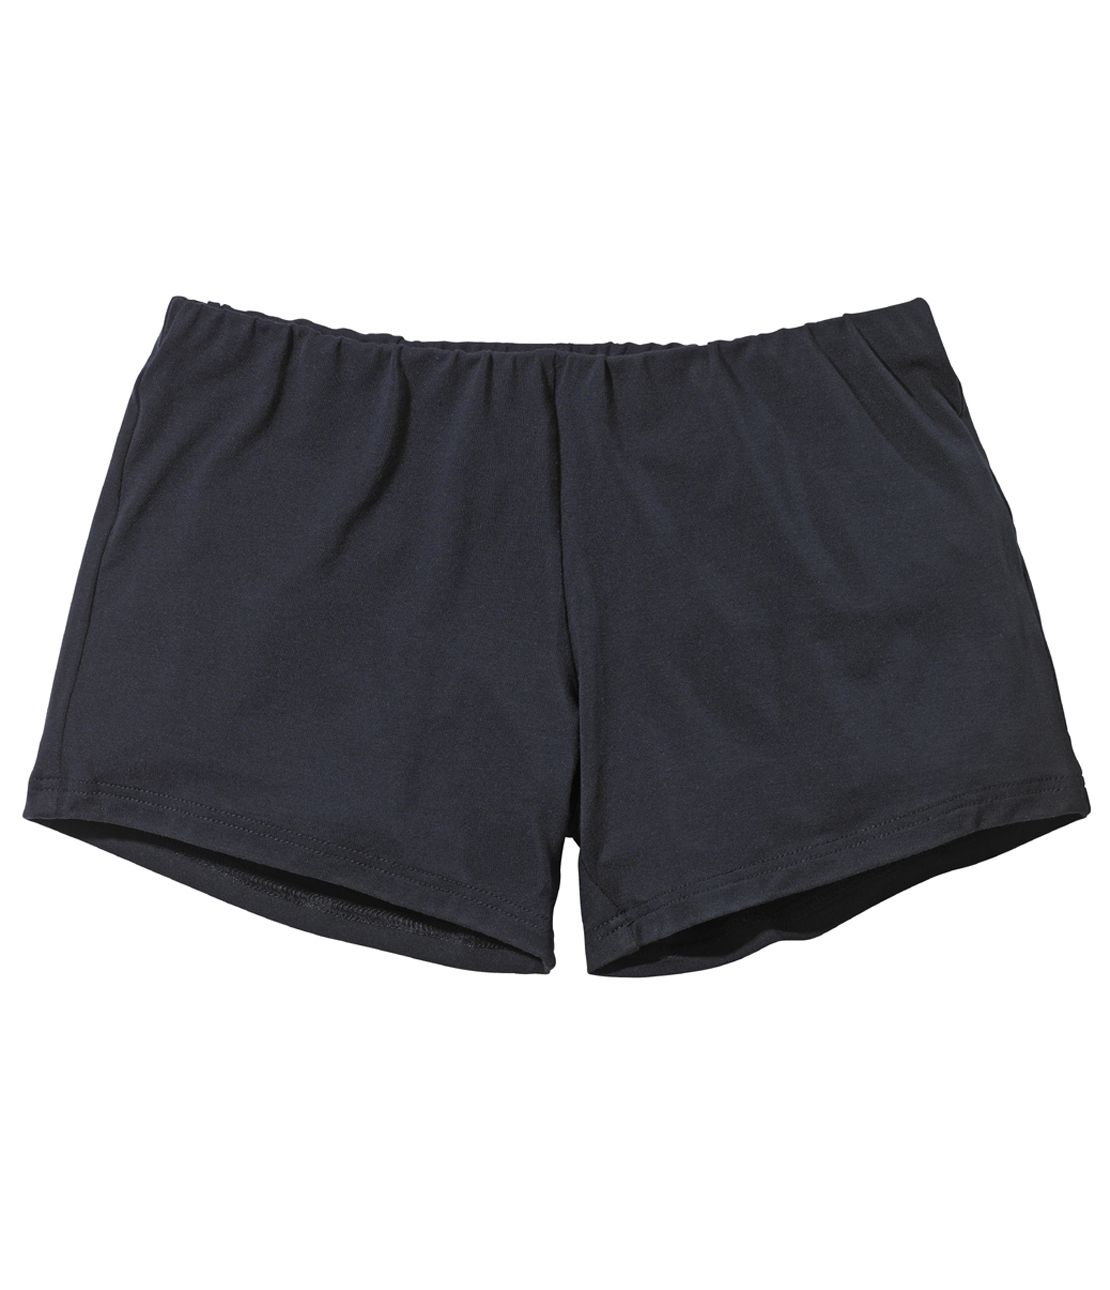 New Sleek Liner Pants